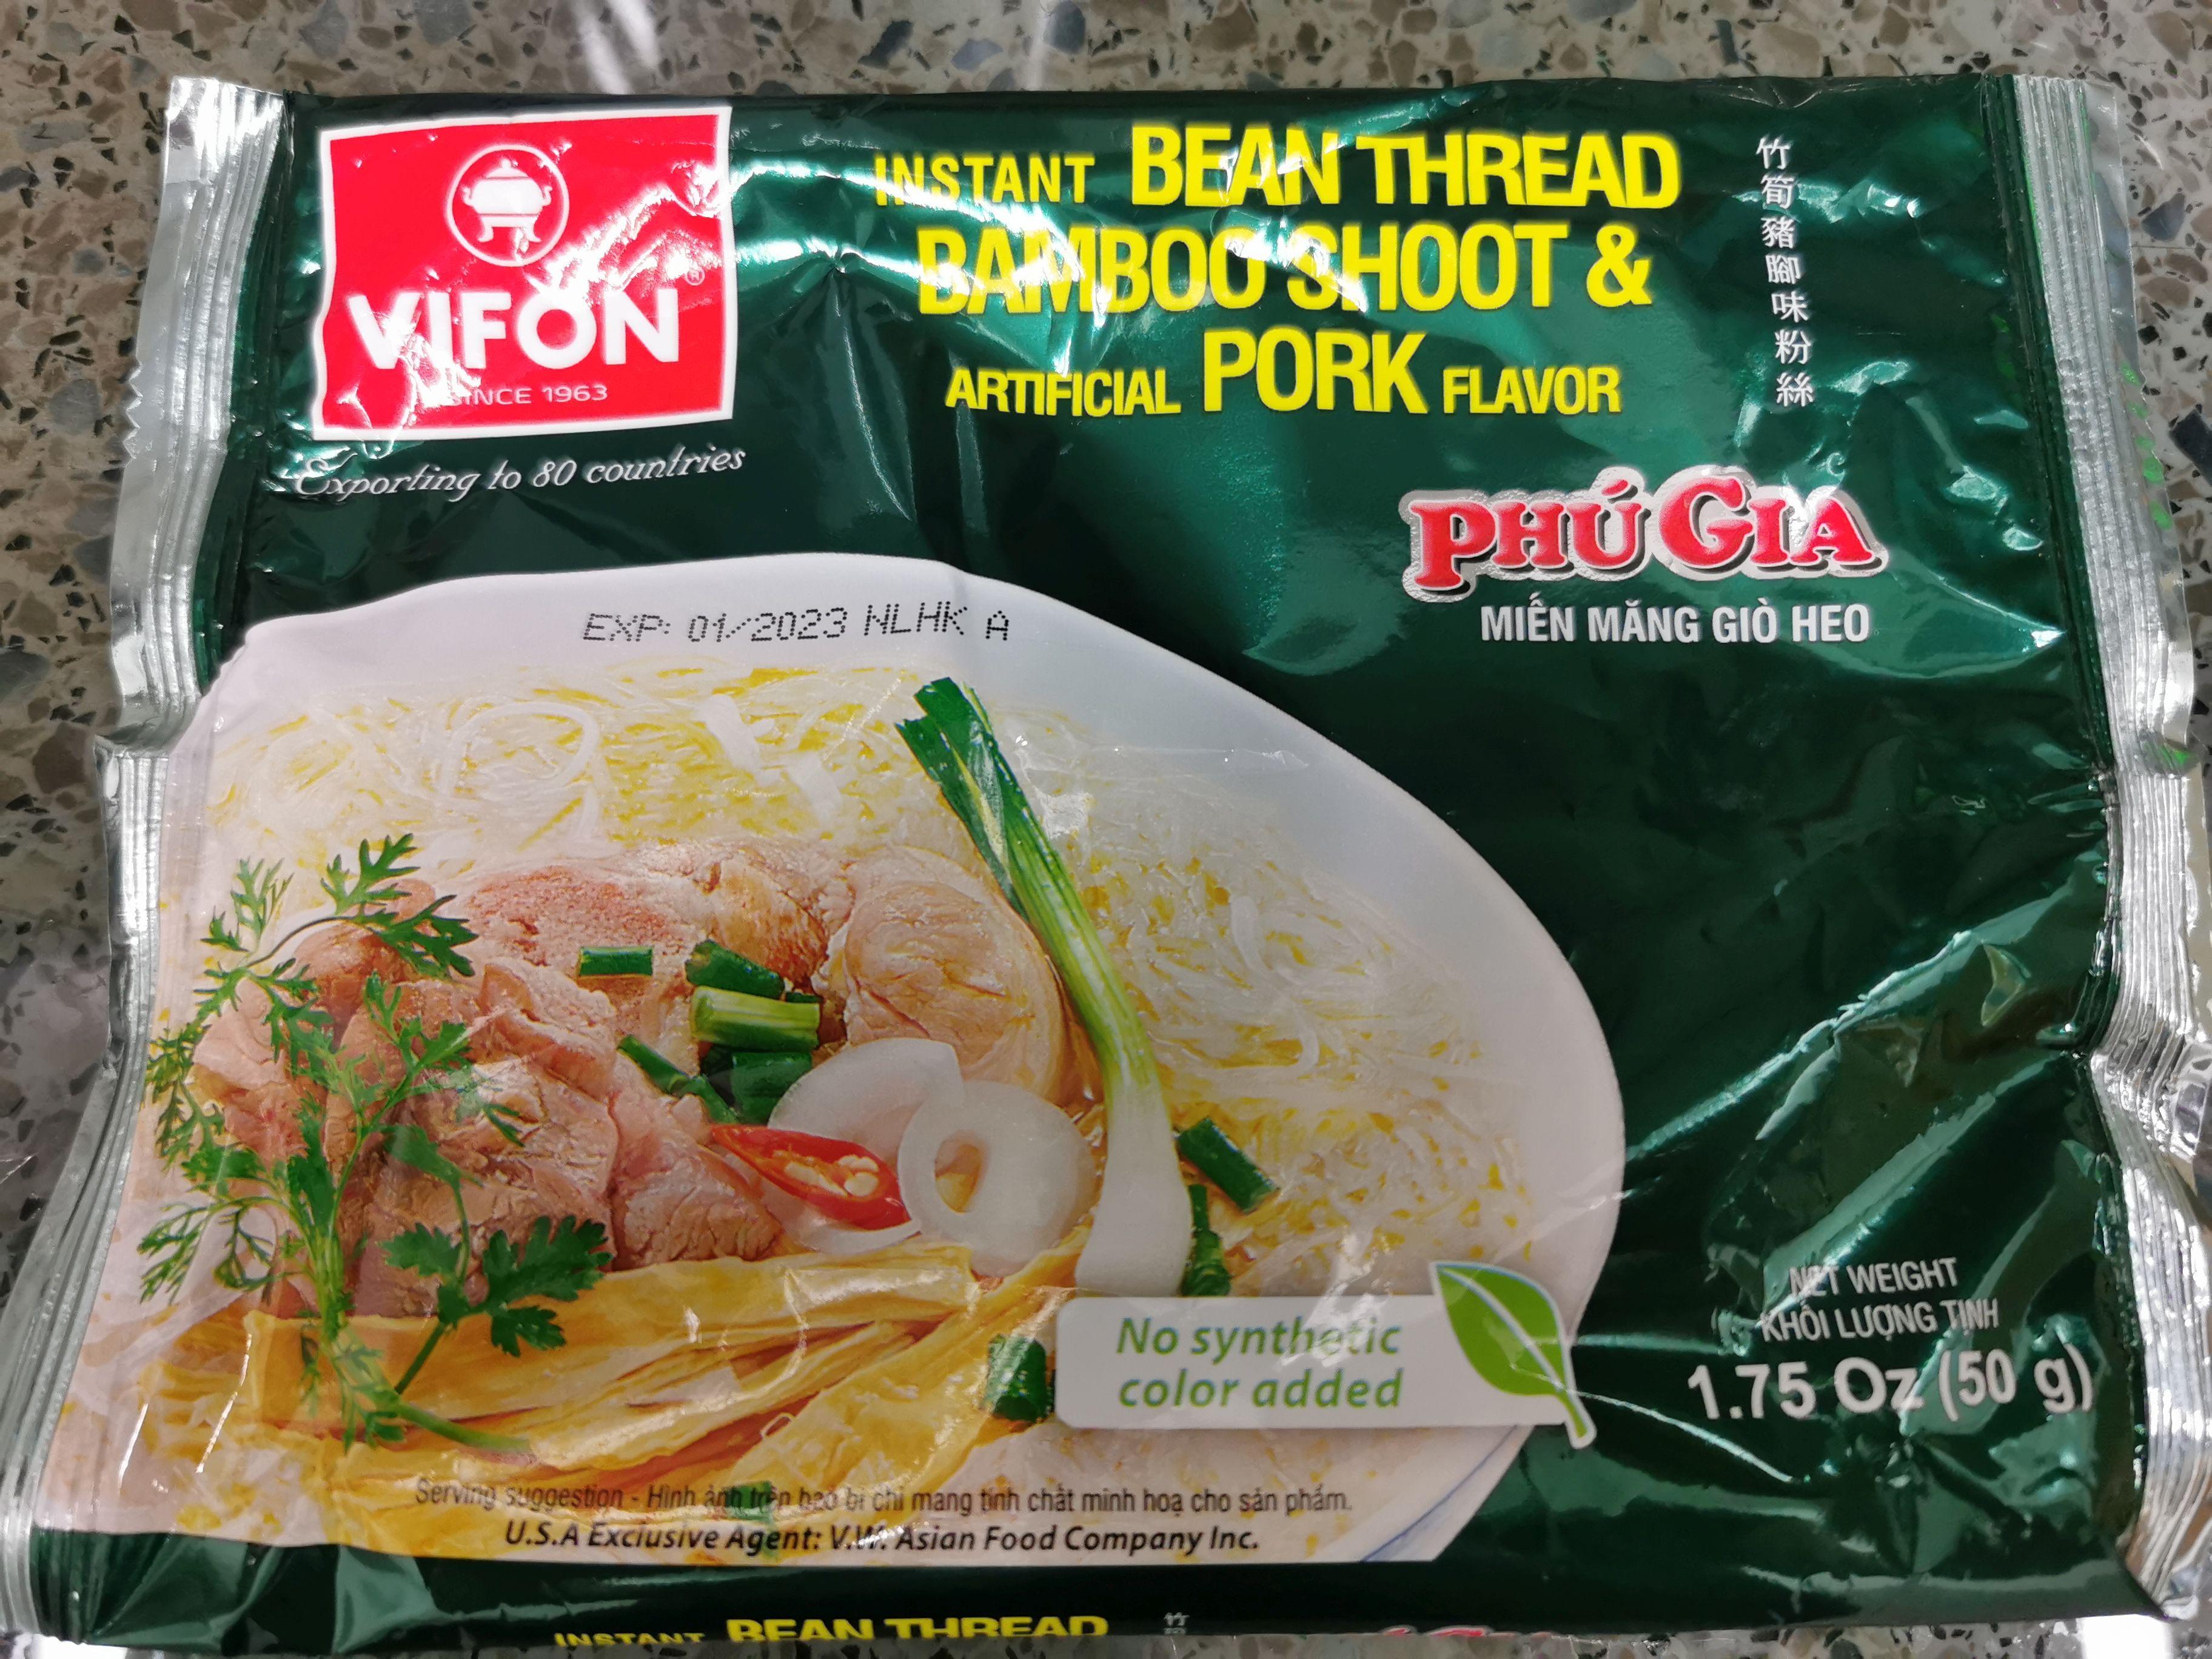 "#1765: Vifon ""Phư Gia Miên Măng Giơ Heo"" (Instant Bean Thread Bamboo Shoot & Artificial Pork Flavor)  (Update 2021)"